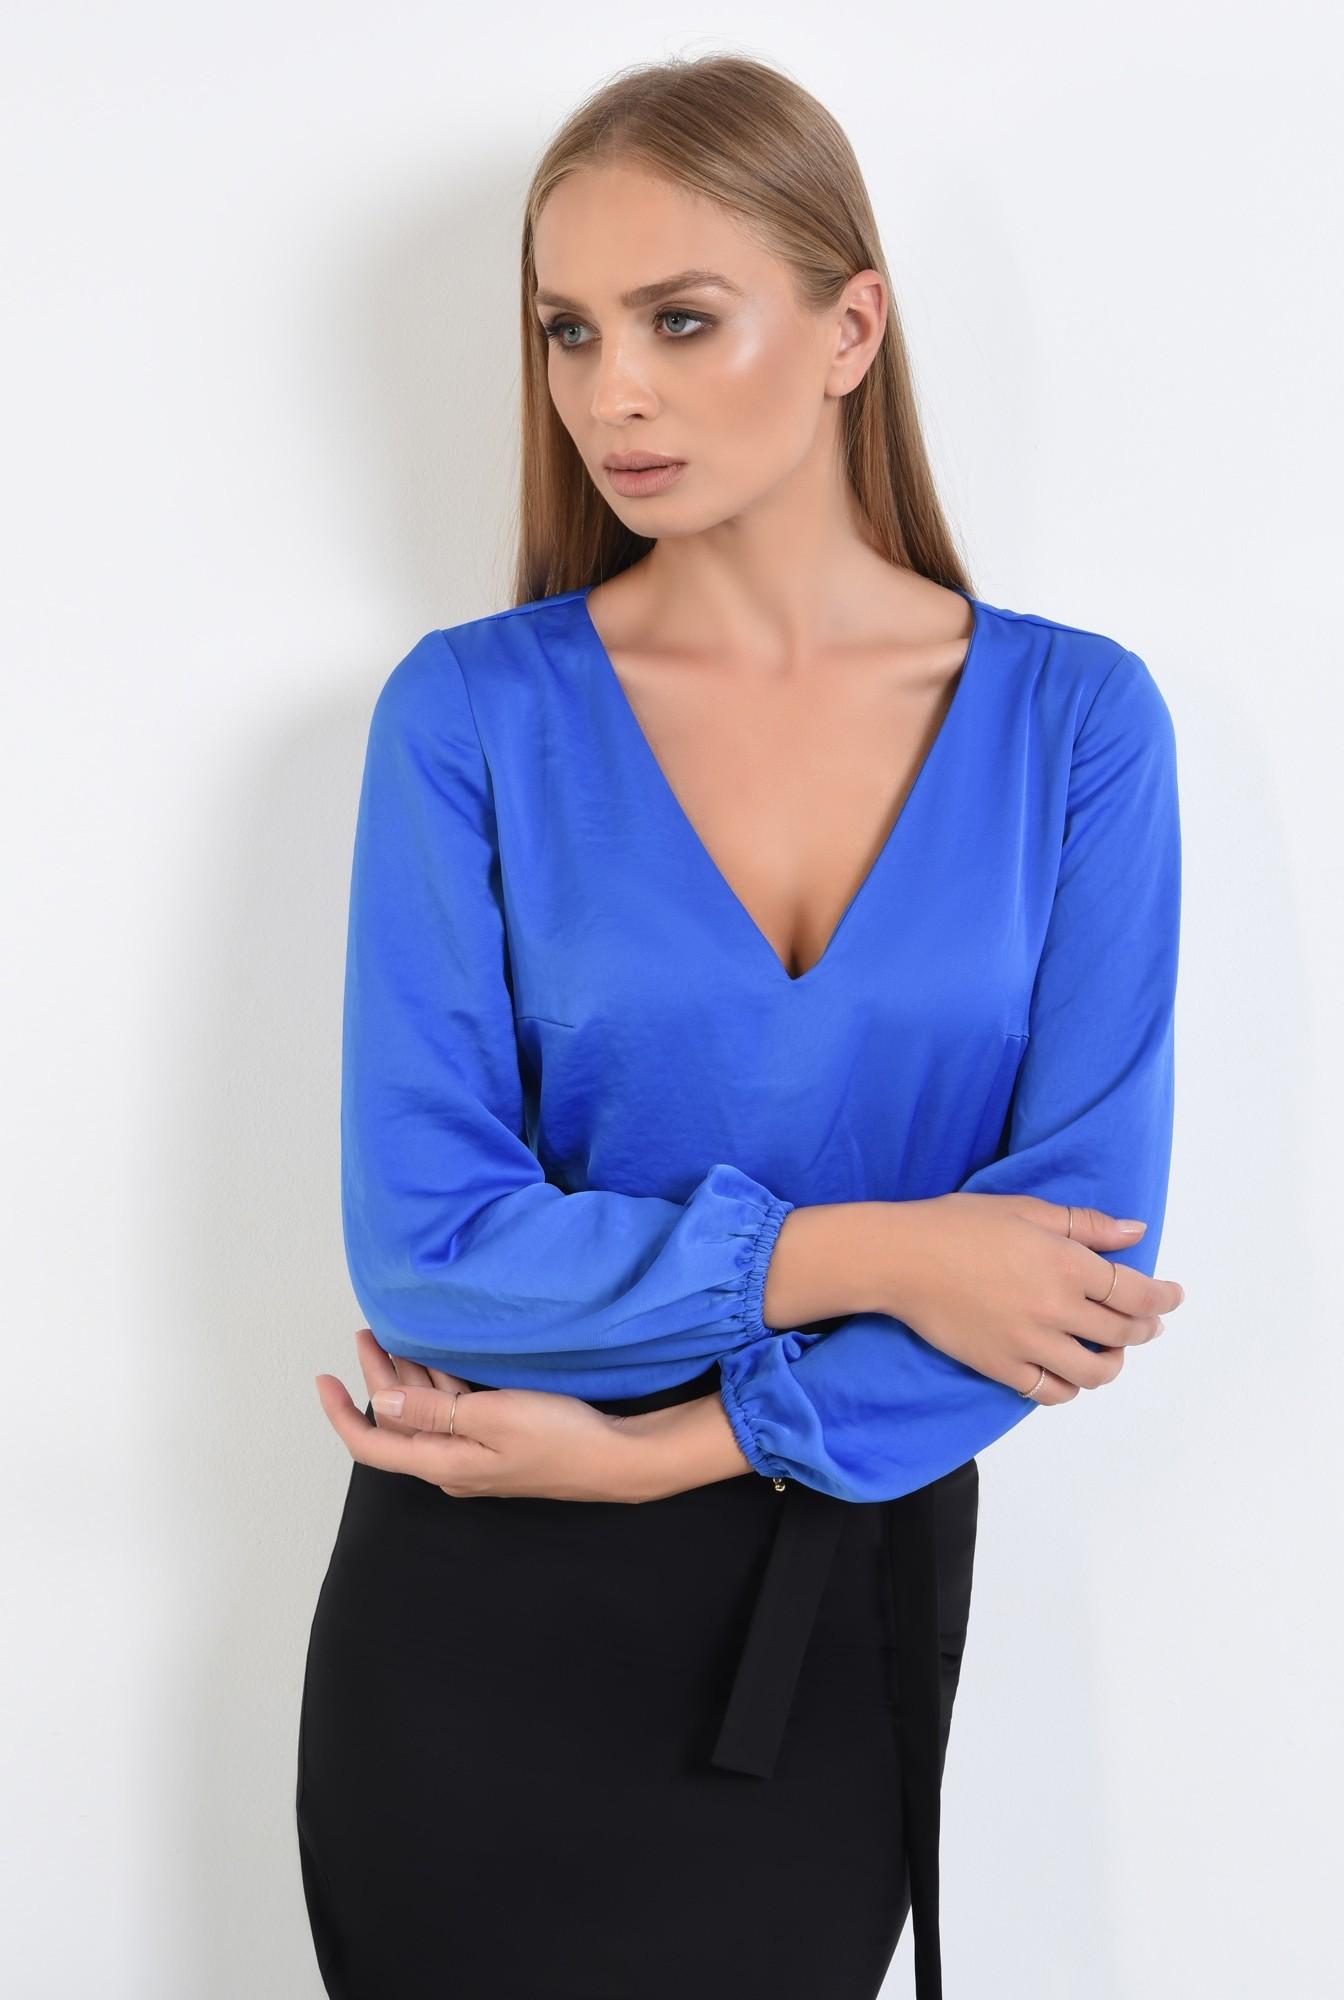 2 - bluza office cu anchior, tesatura satinata, bluze online